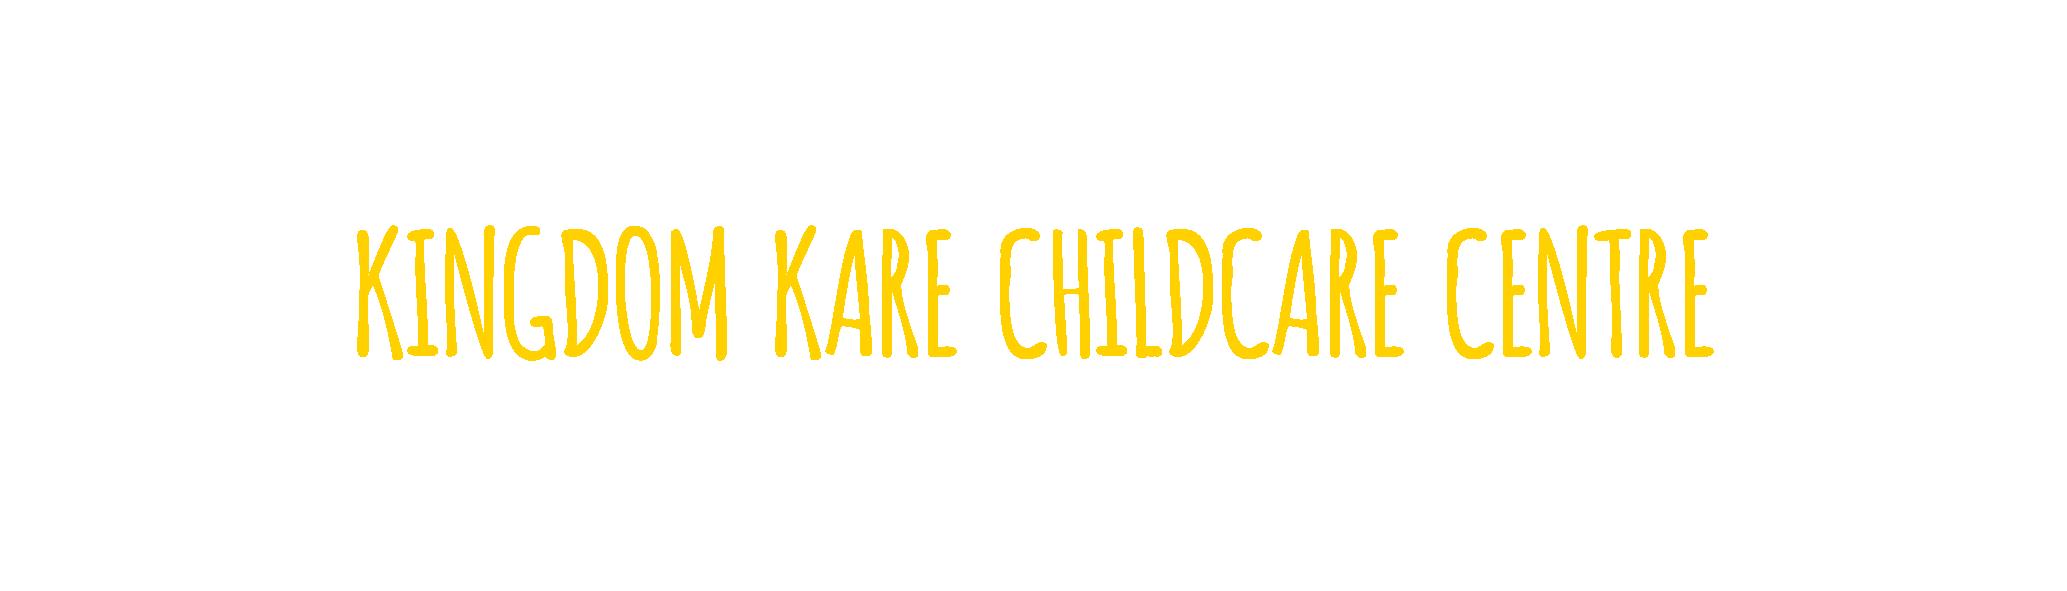 Kingdom-Kare-Childcare-Centre-Rotating-Header3.png